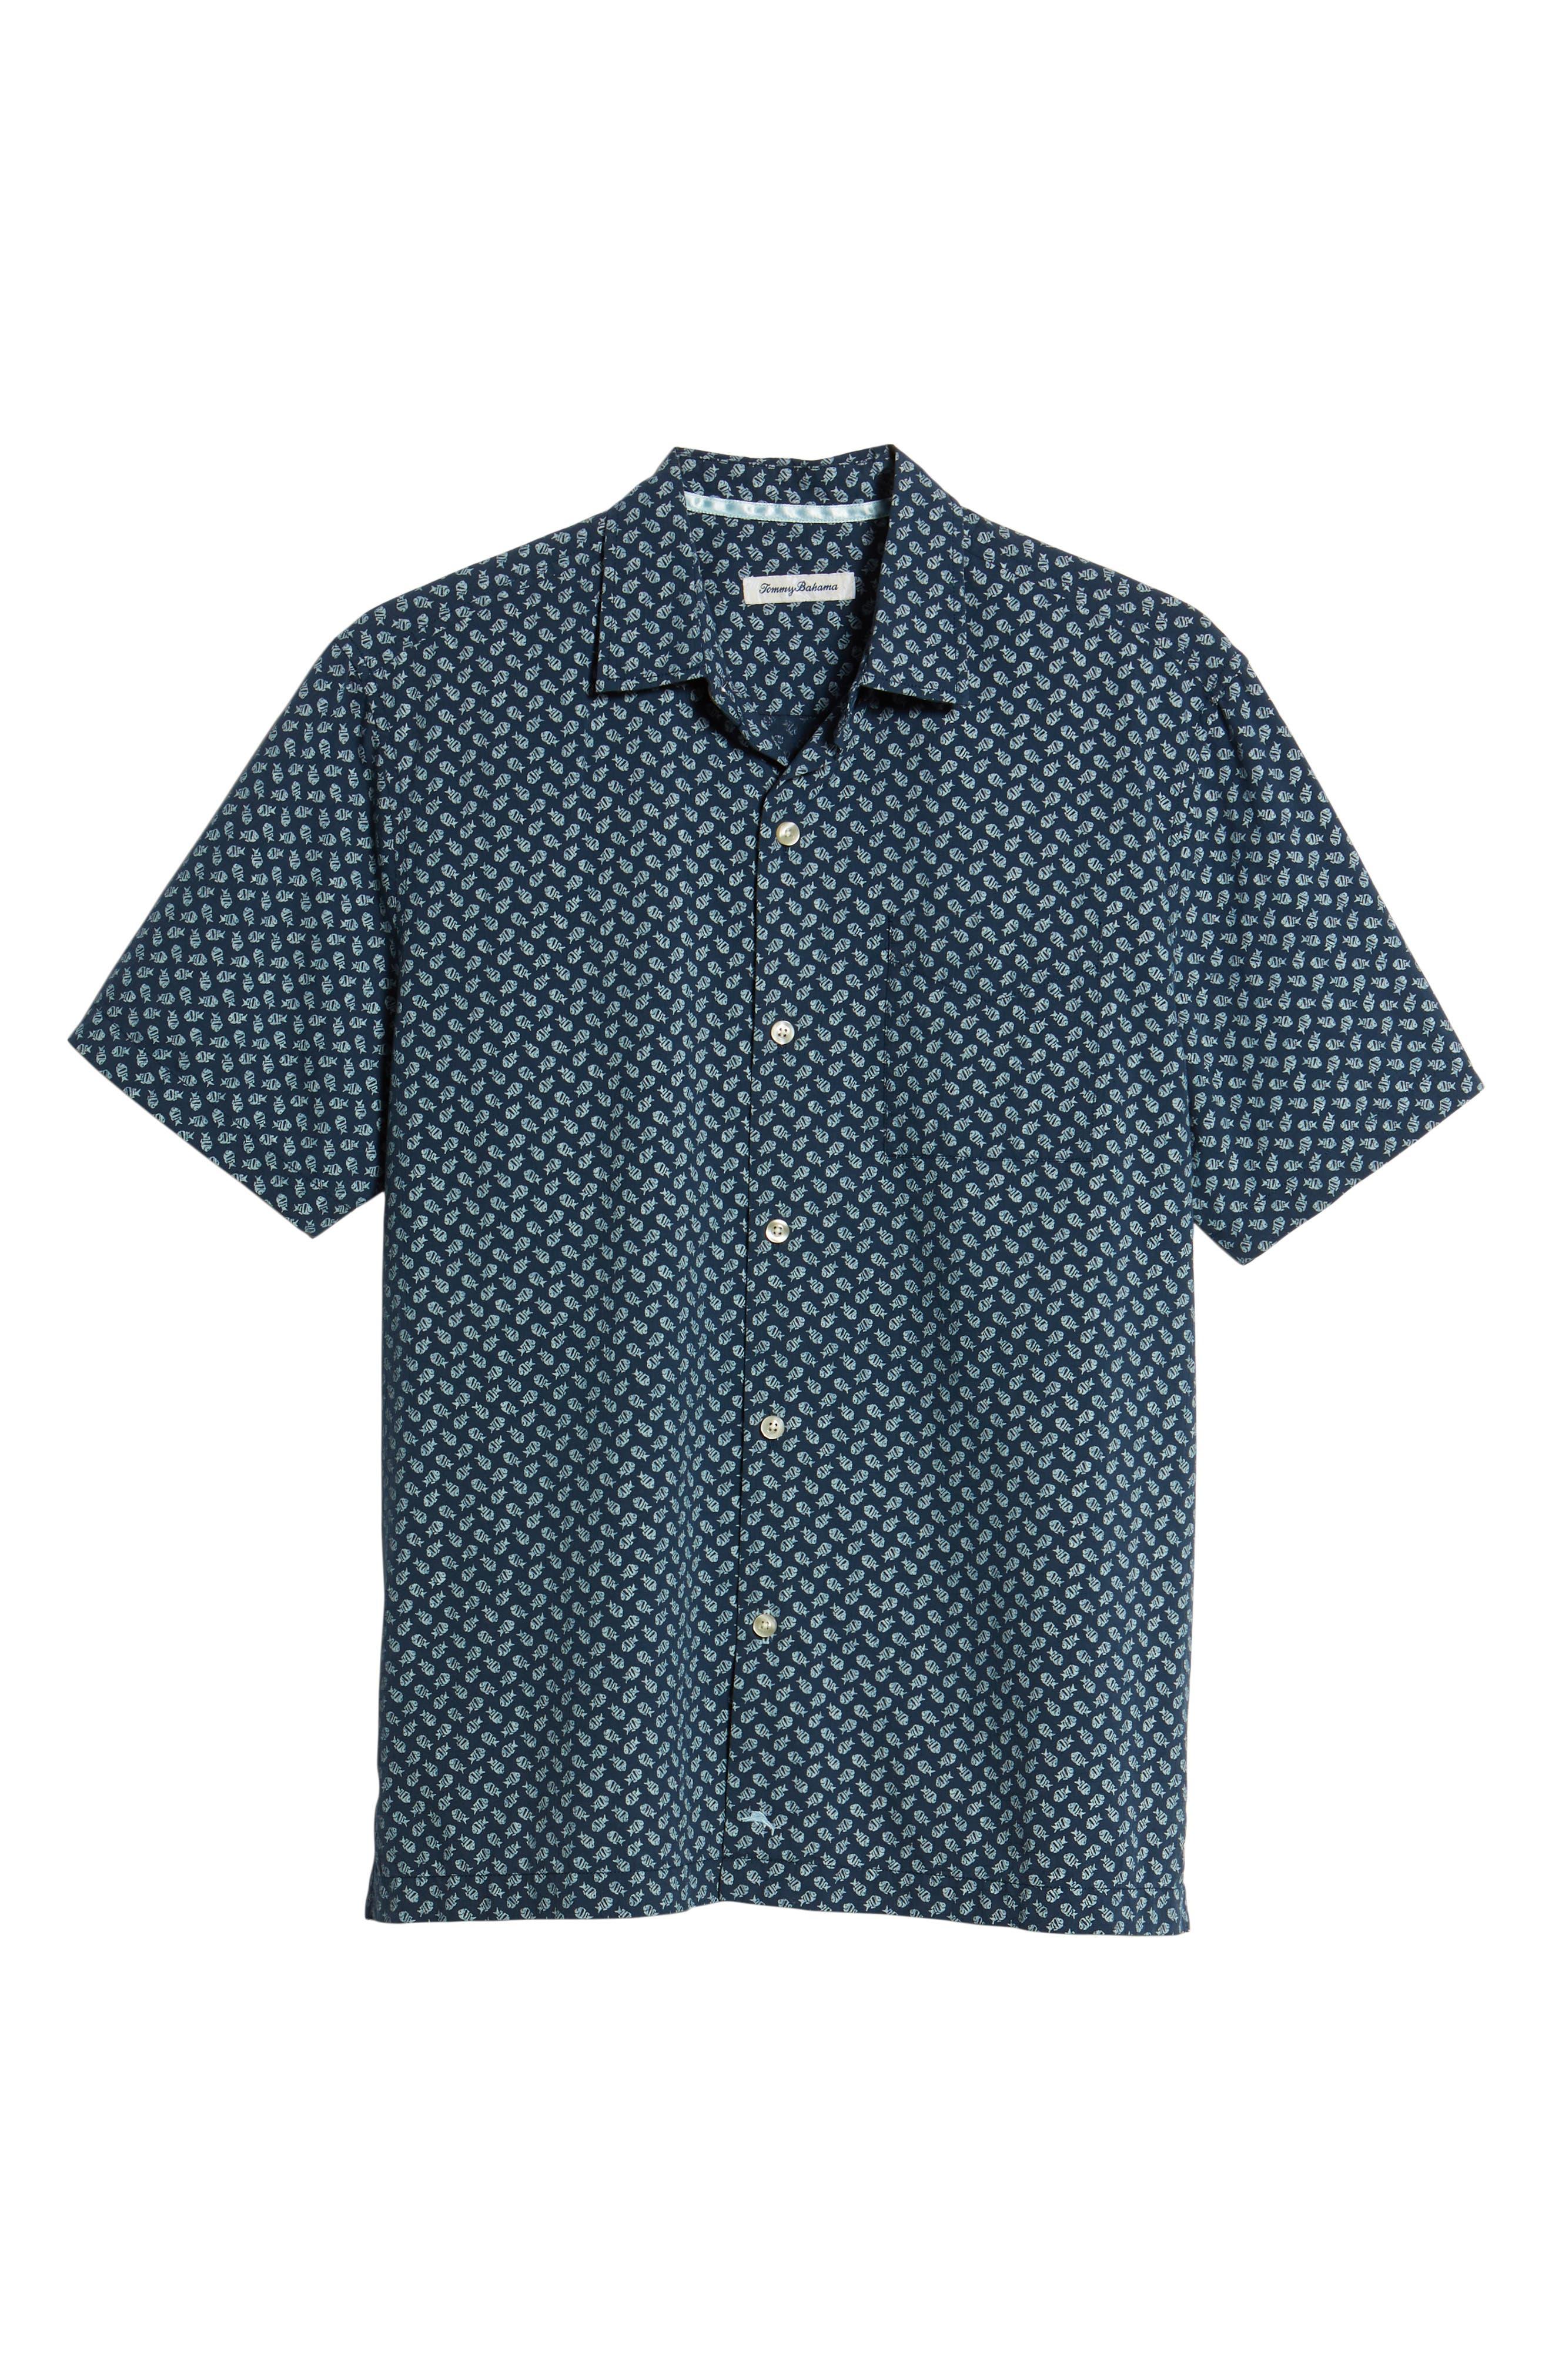 A-Fish-ianado Cotton & Silk Camp Shirt,                             Alternate thumbnail 6, color,                             Ocean Deep